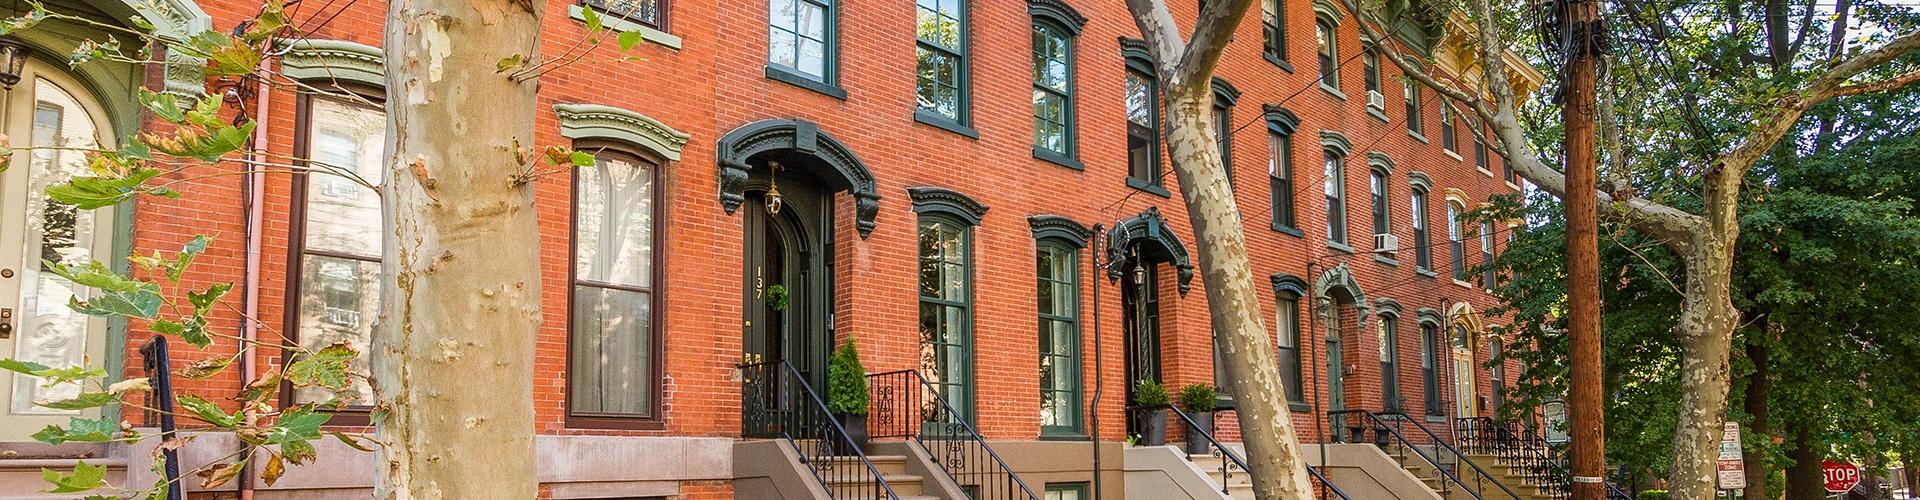 Historic Spotlight: 137 Mercer Street